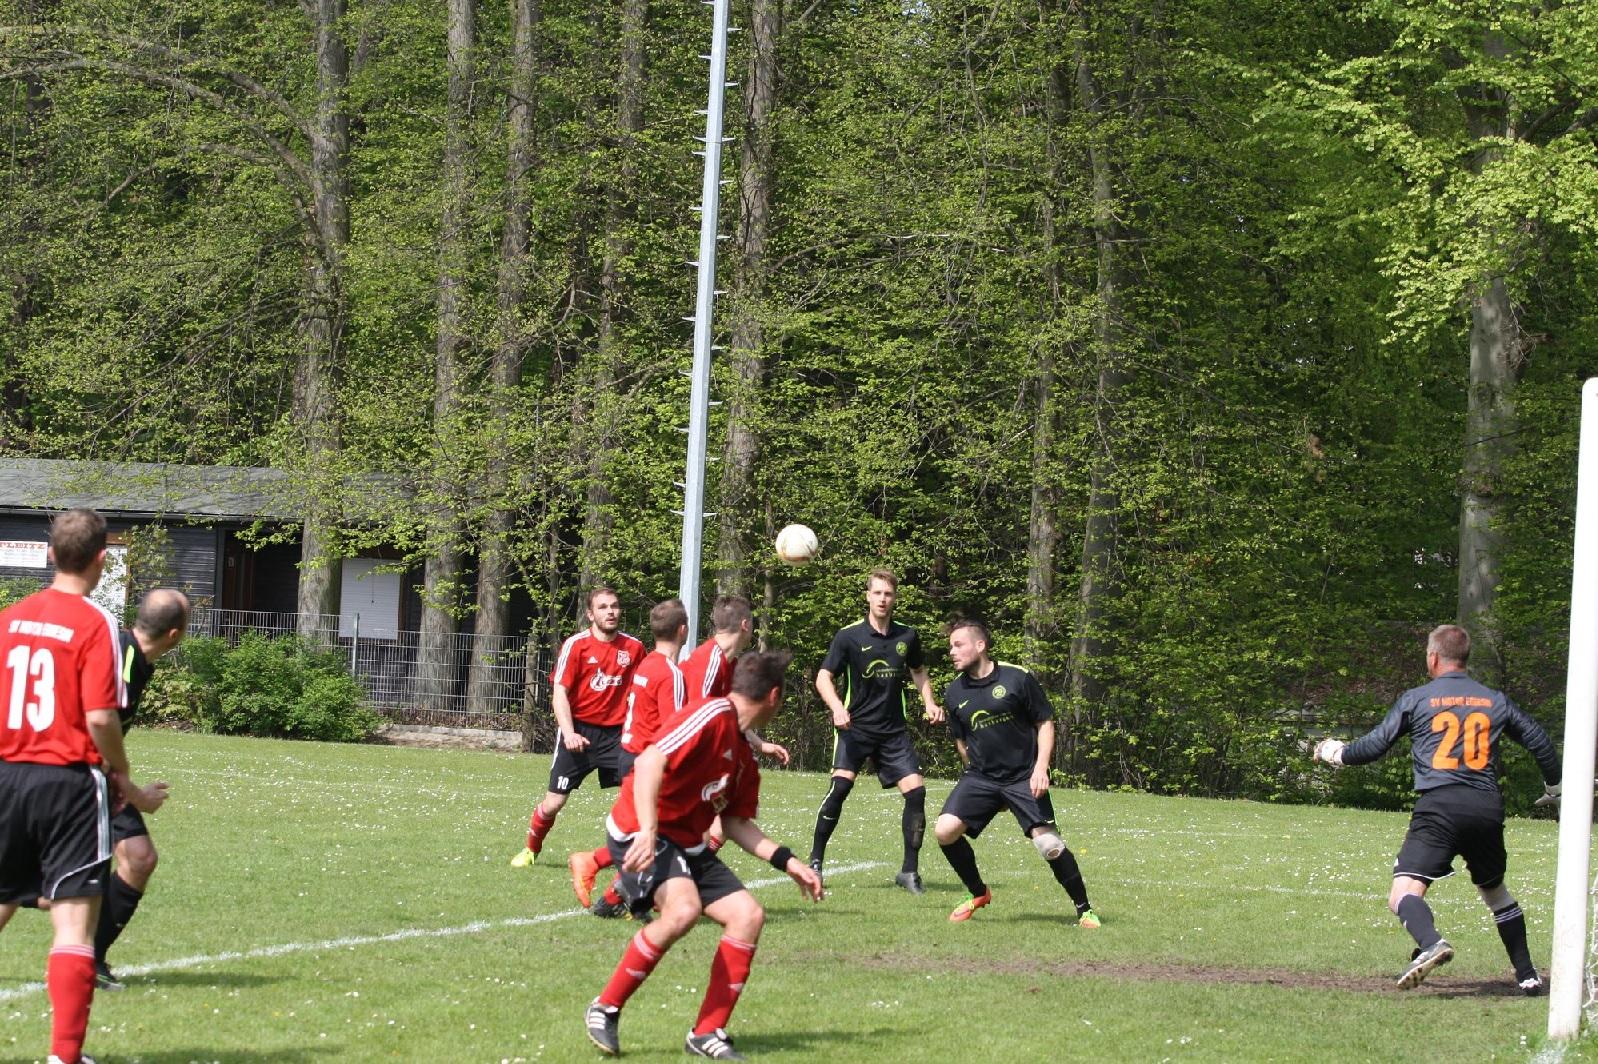 Landesklasse Fußball: FC Insel Usedom - HSG Uni Greifswald